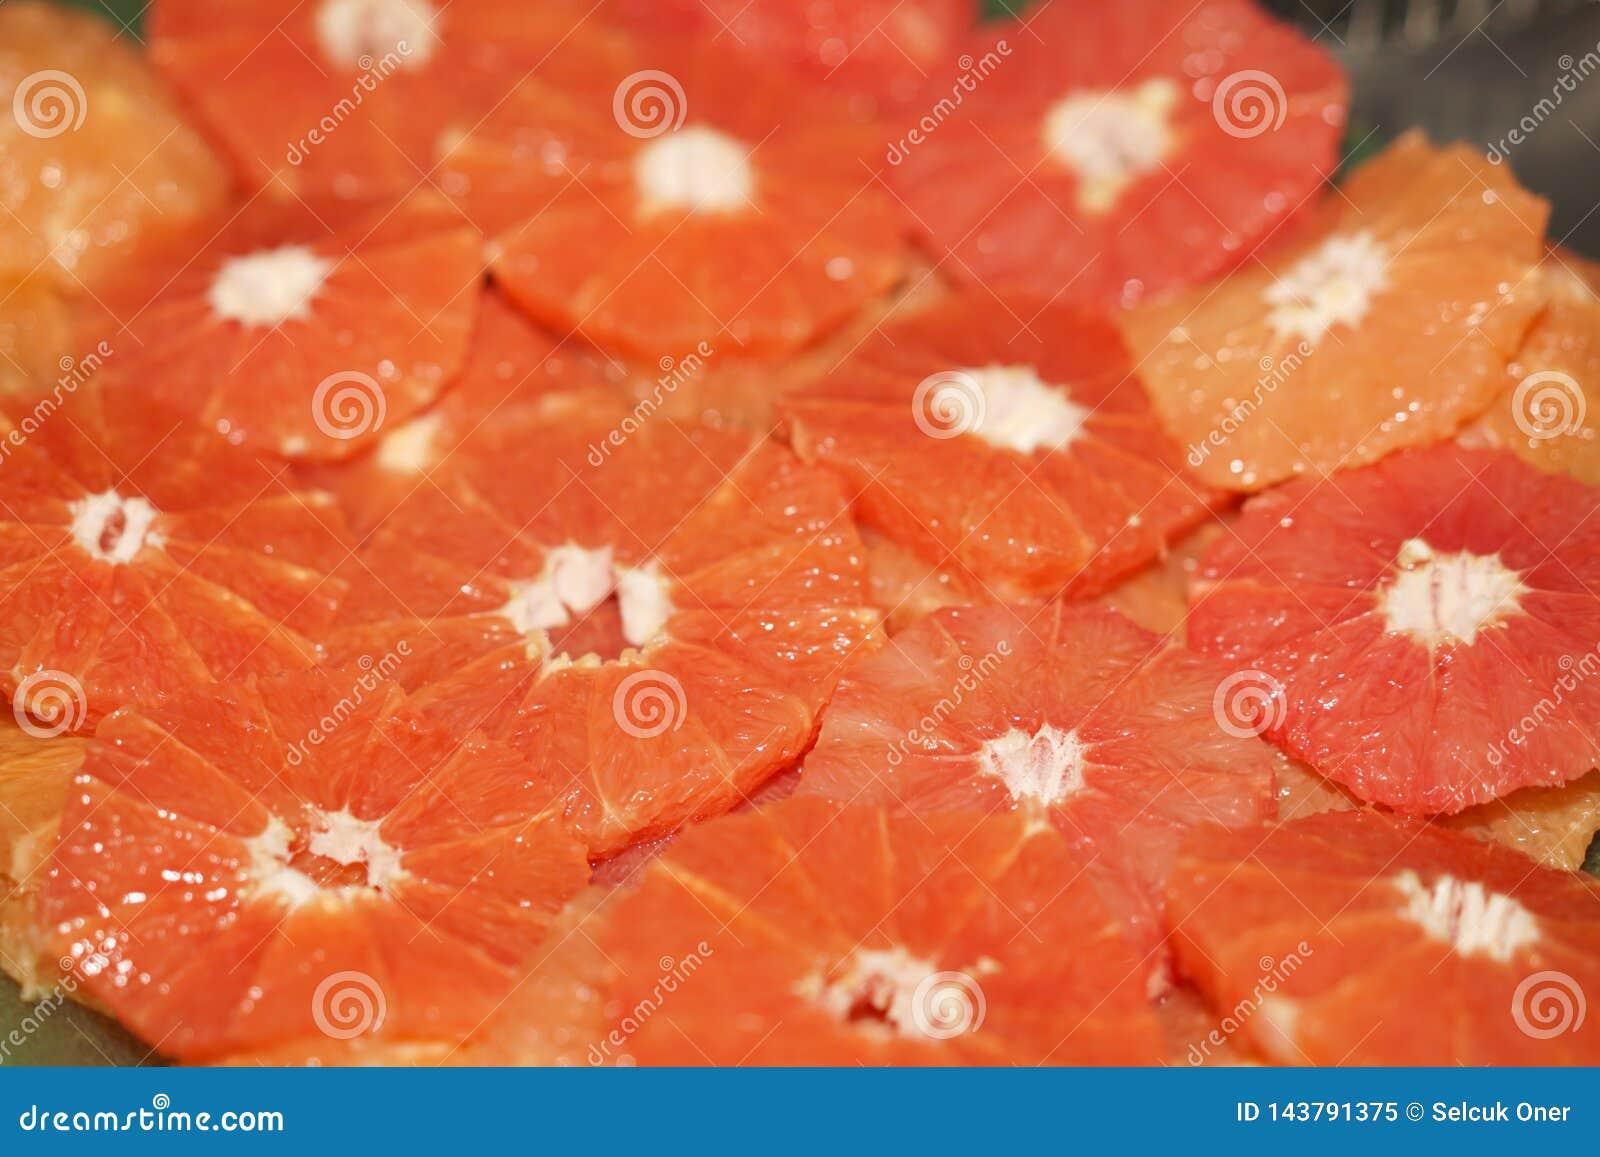 Tranches d?licieuses d orange